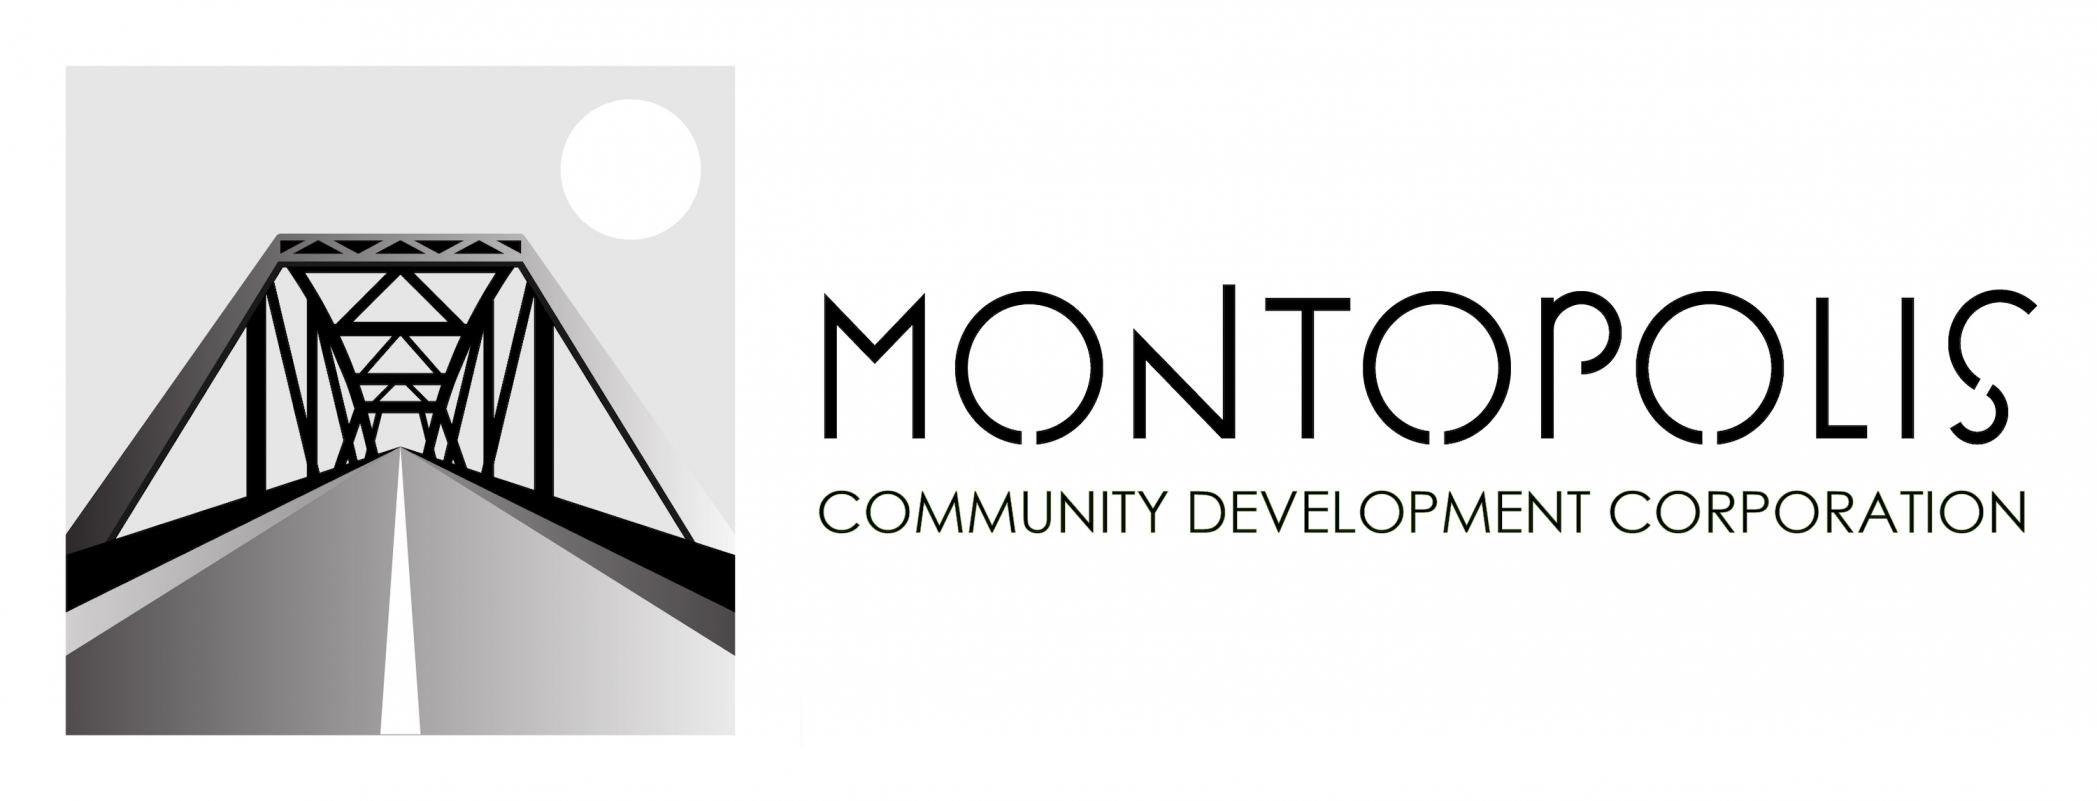 Montopolis Community Development Corporation Logo